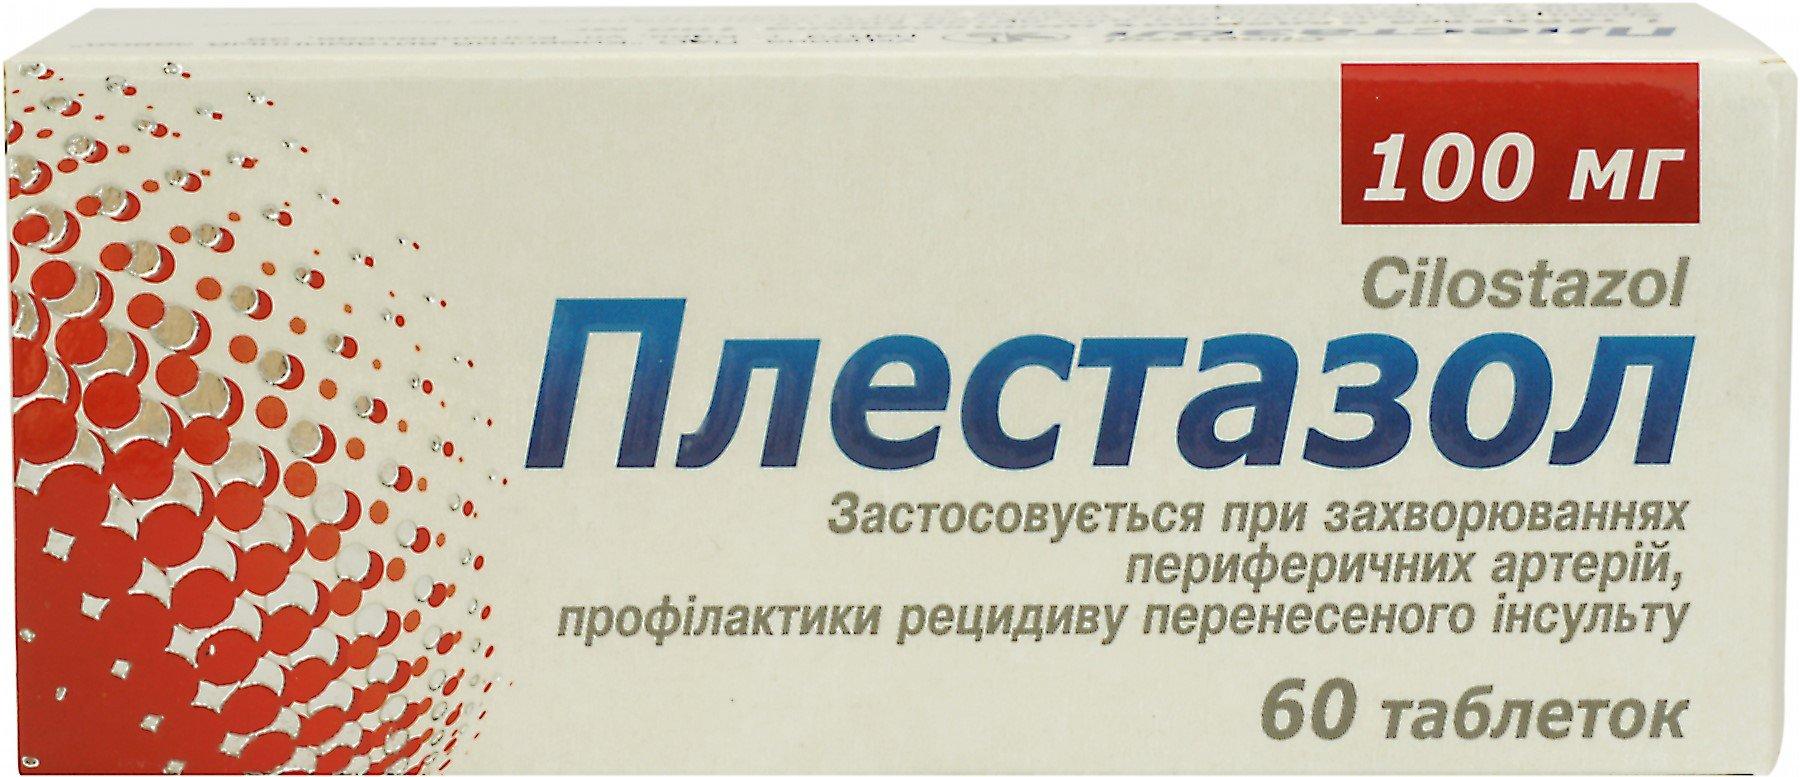 Plestazol (cilostazol) tablets 100 mg. №60